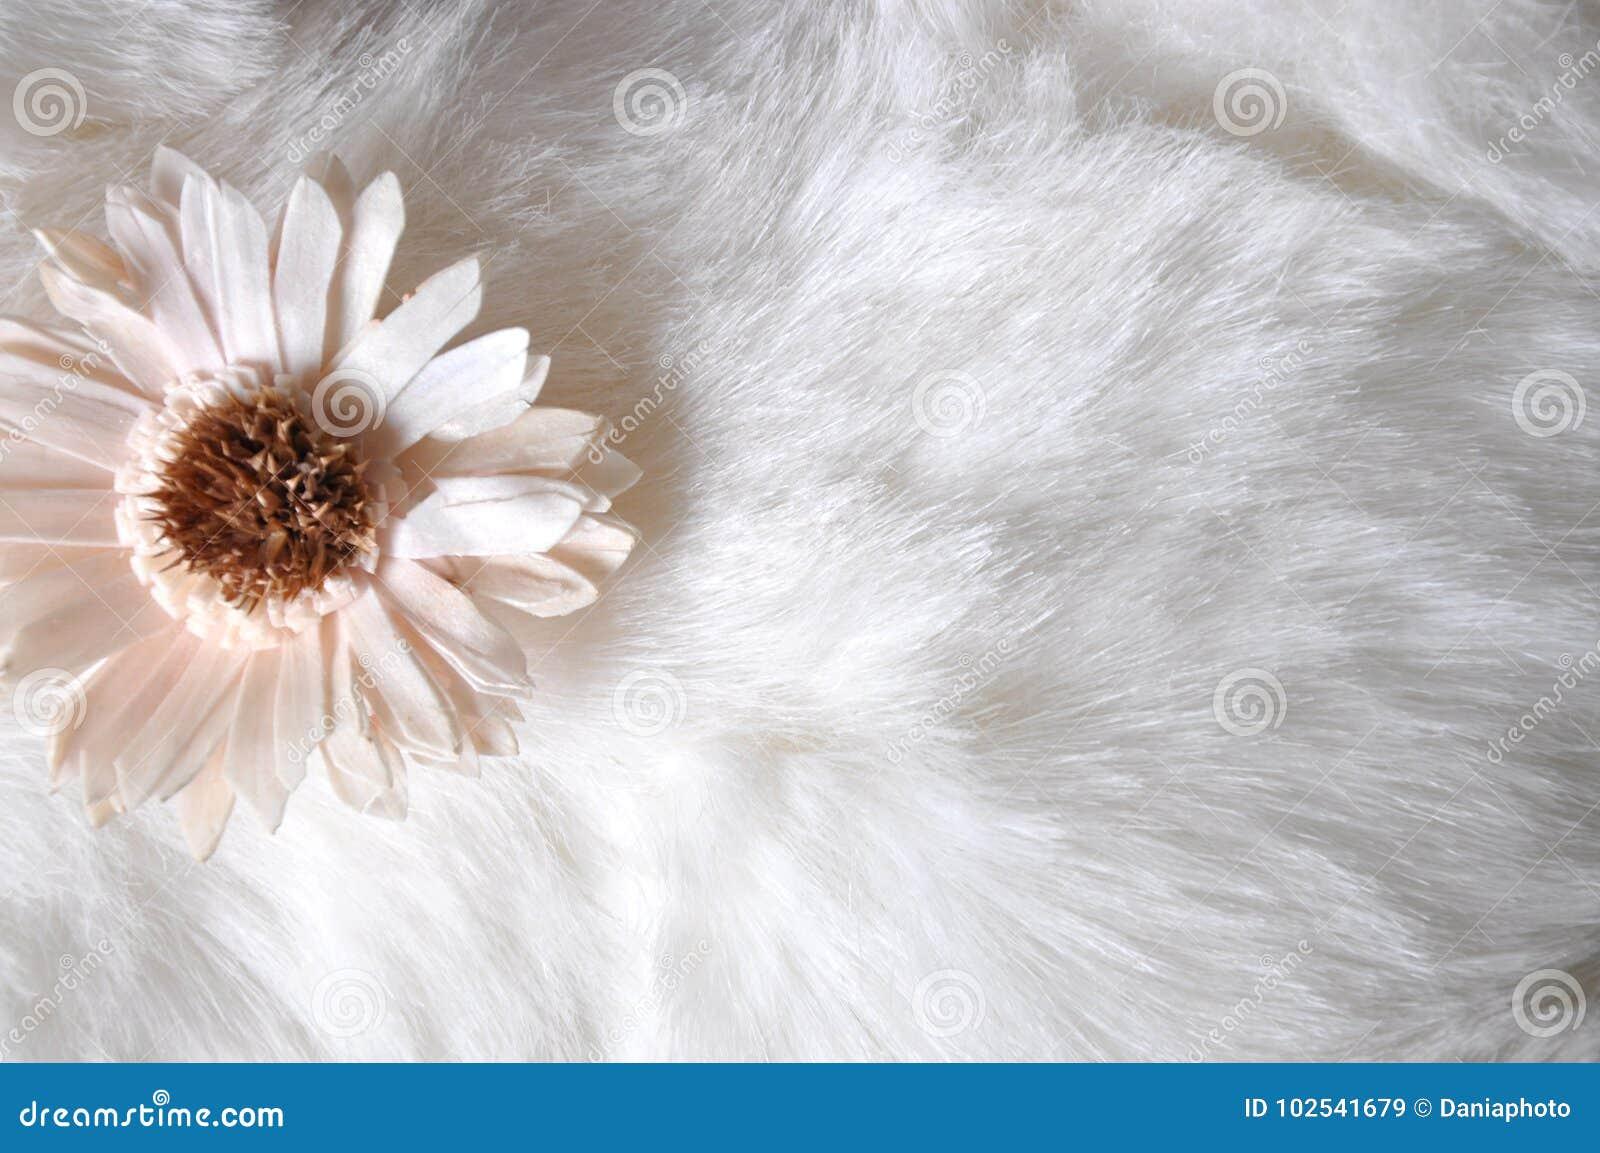 Little flower on white puffy background stock image image of download little flower on white puffy background stock image image of fabric close mightylinksfo